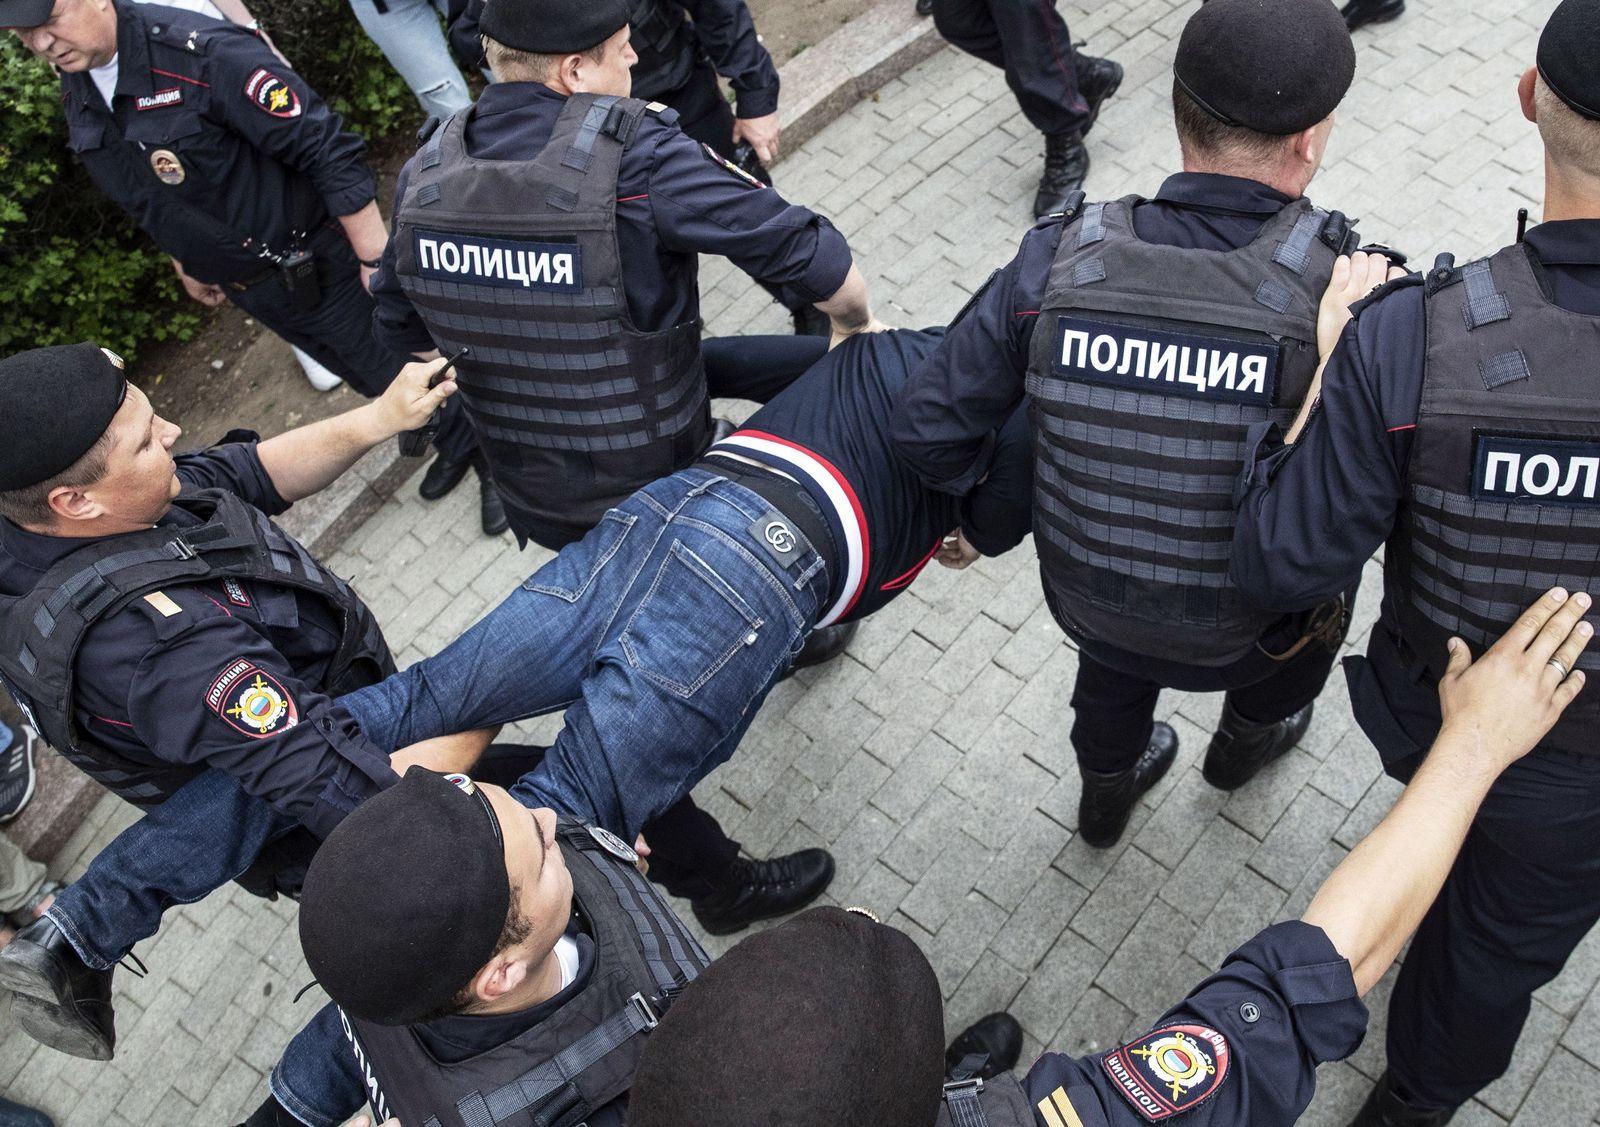 Moskau/ Festnahmen